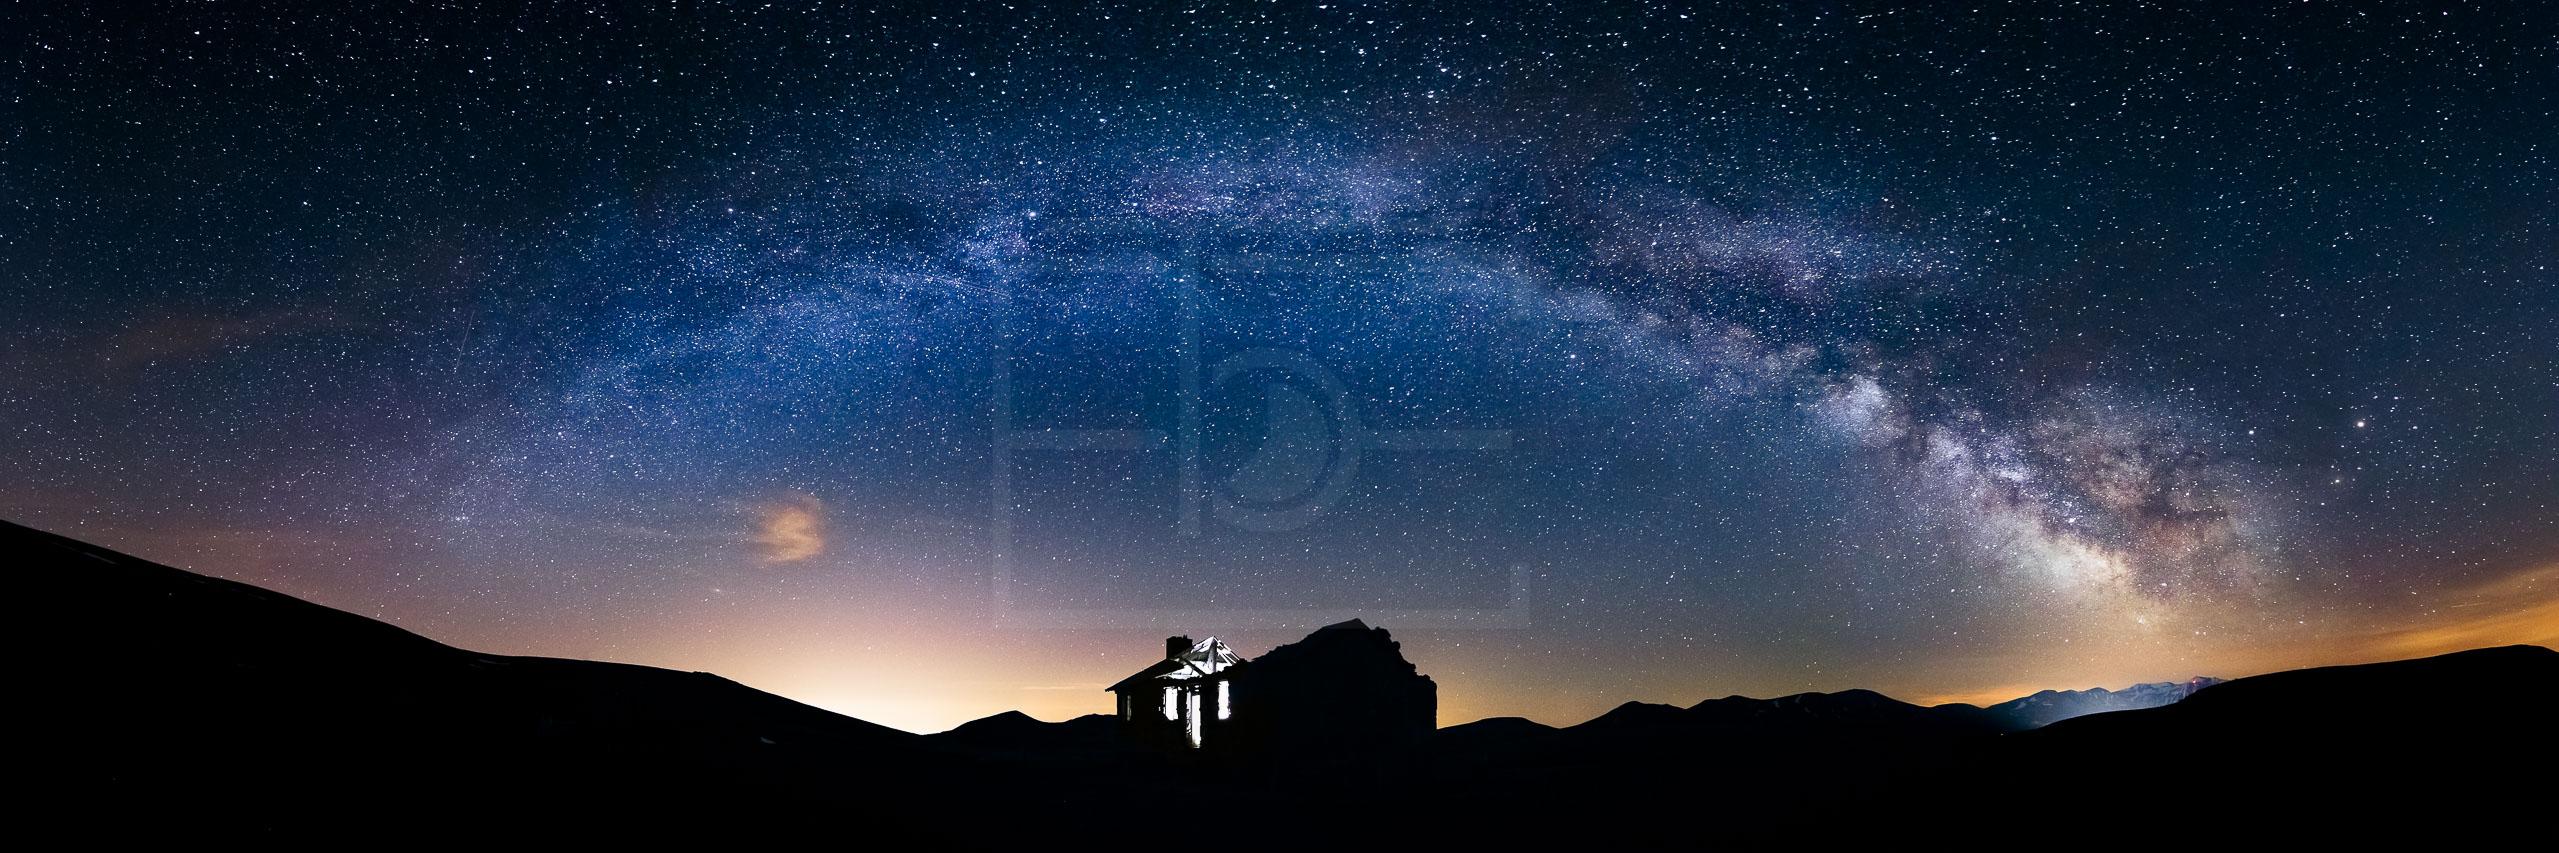 Dream-House-Panoramique-1.jpg